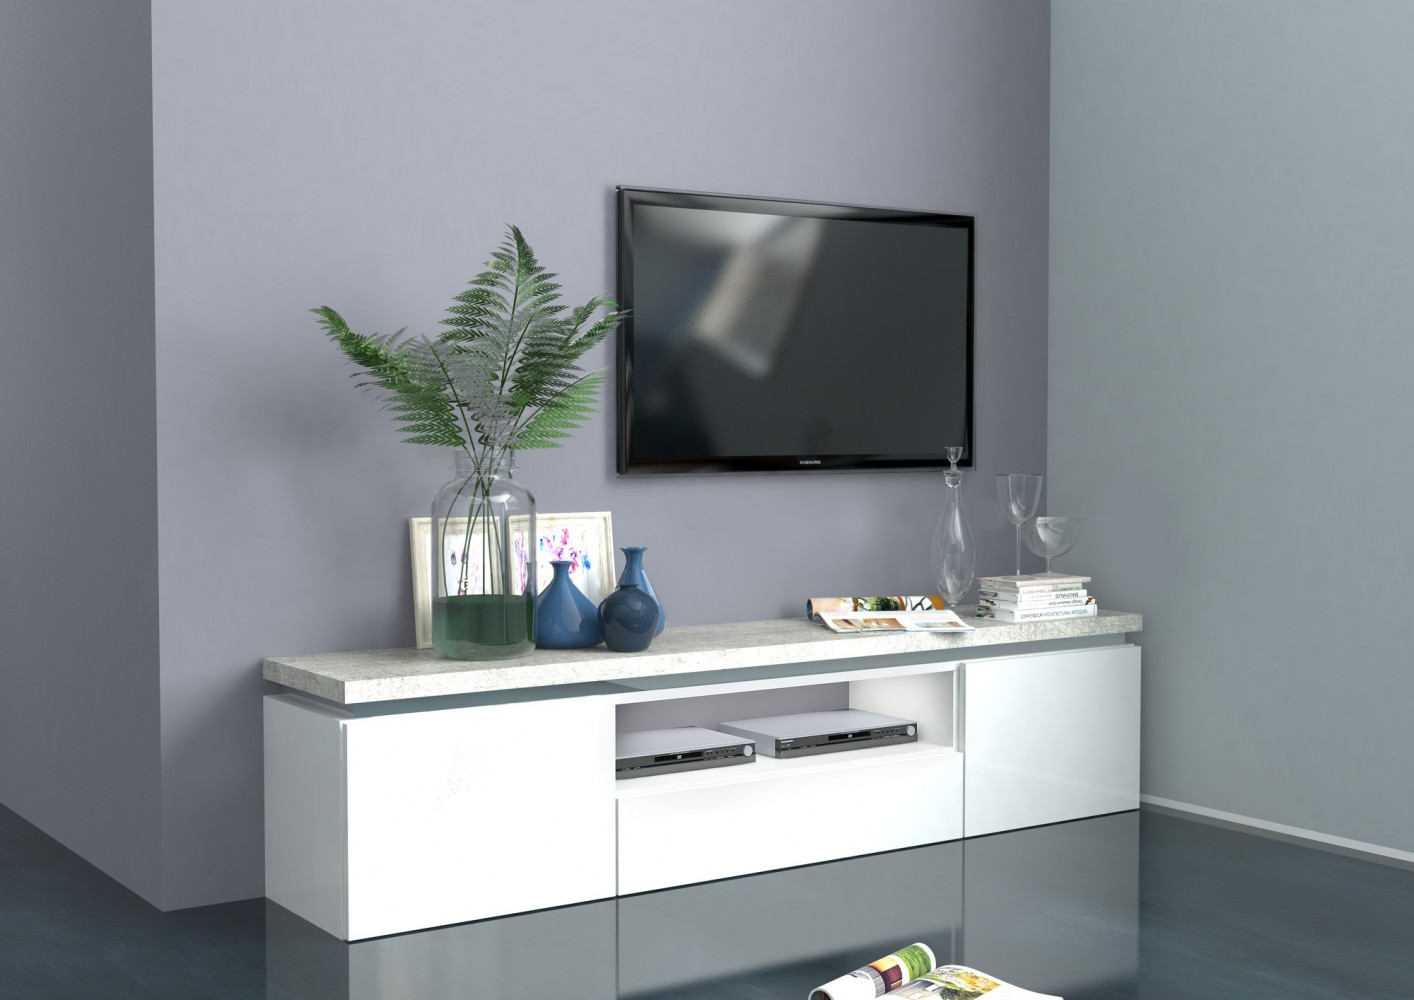 Wohnwand design modern  Tecnos GAZEBO Lowboard, 180cm Wohnwand Mediawand TV Italian Design ...